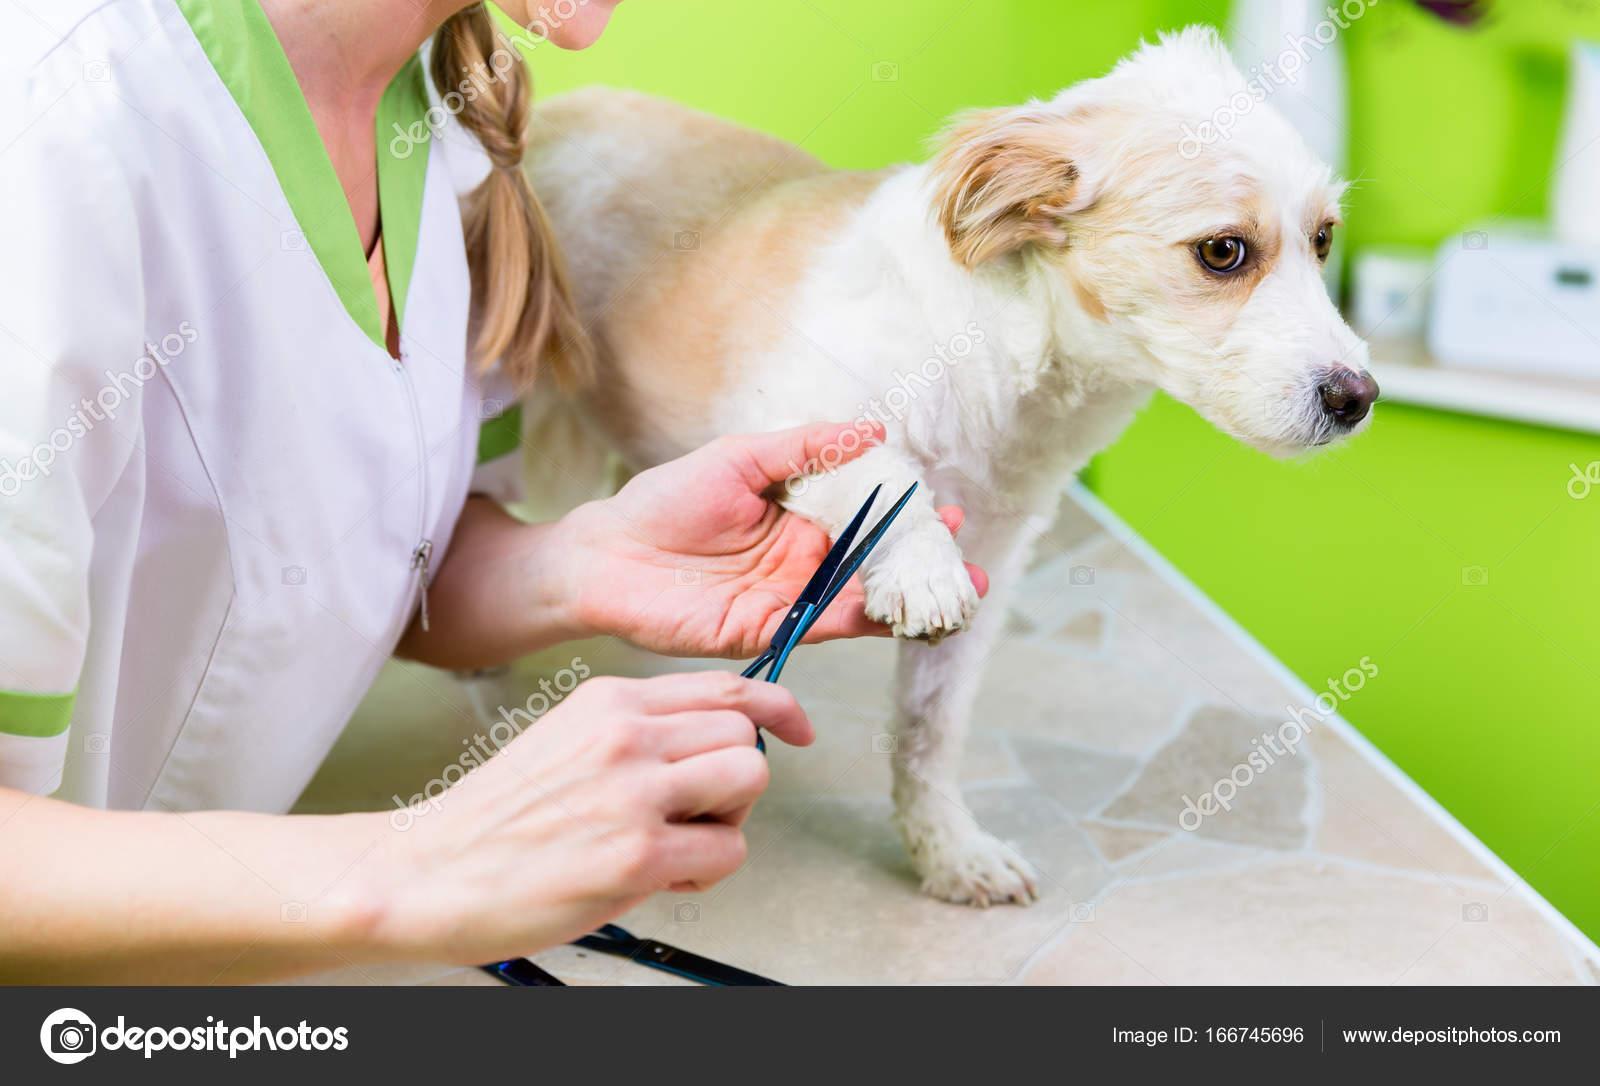 Manicure For Dog In Pet Grooming Salon Stock Photo C Kzenon 166745696